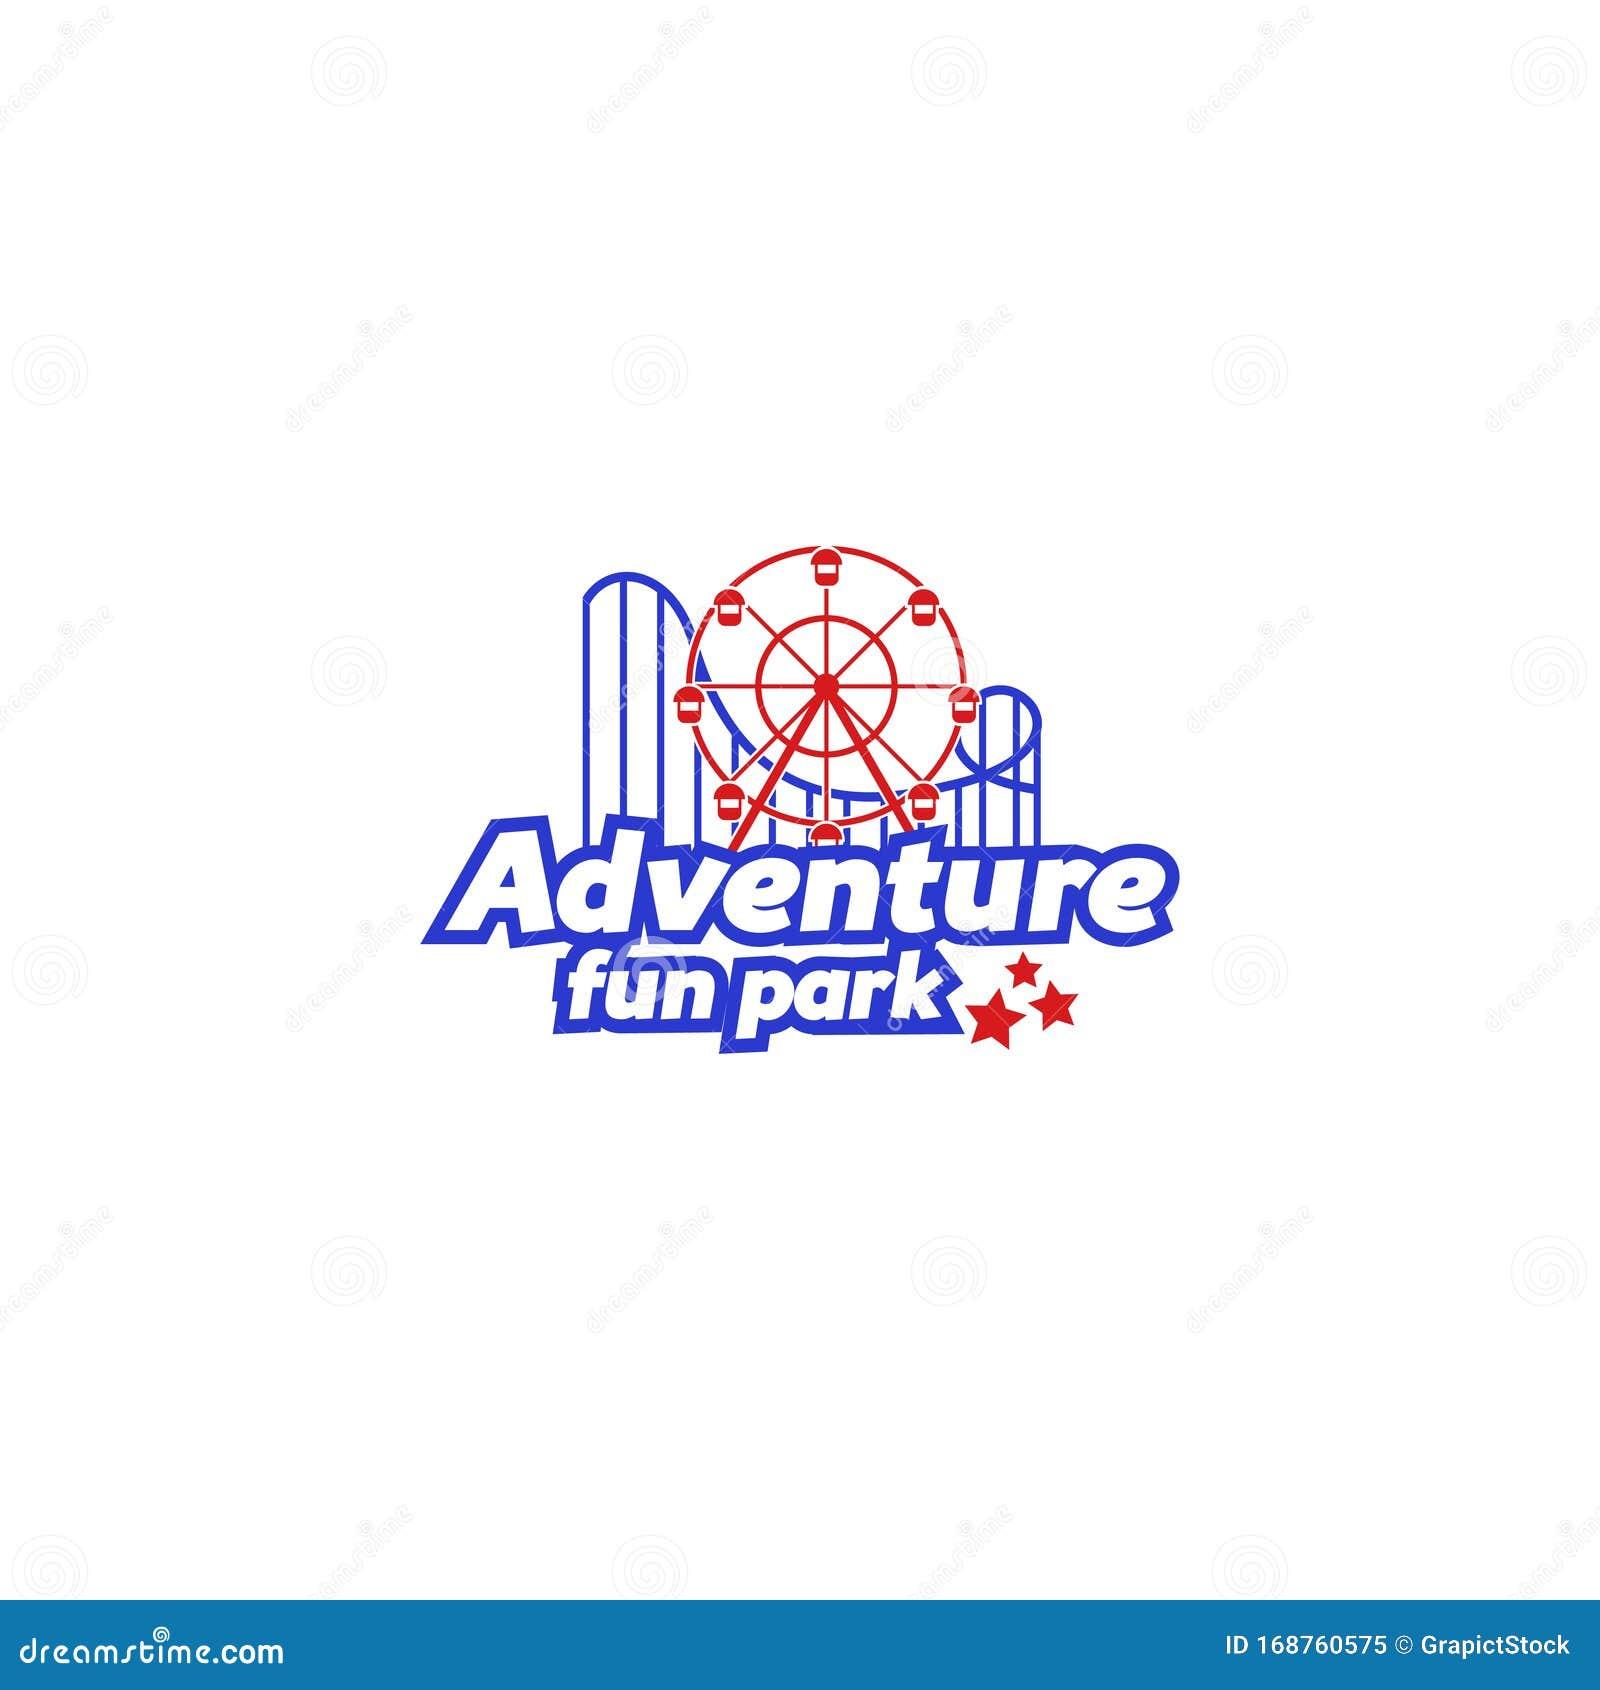 Amusement Park Fun Park Or Adventure Park Stock Vector Illustration Of Adventure Ferris 168760575